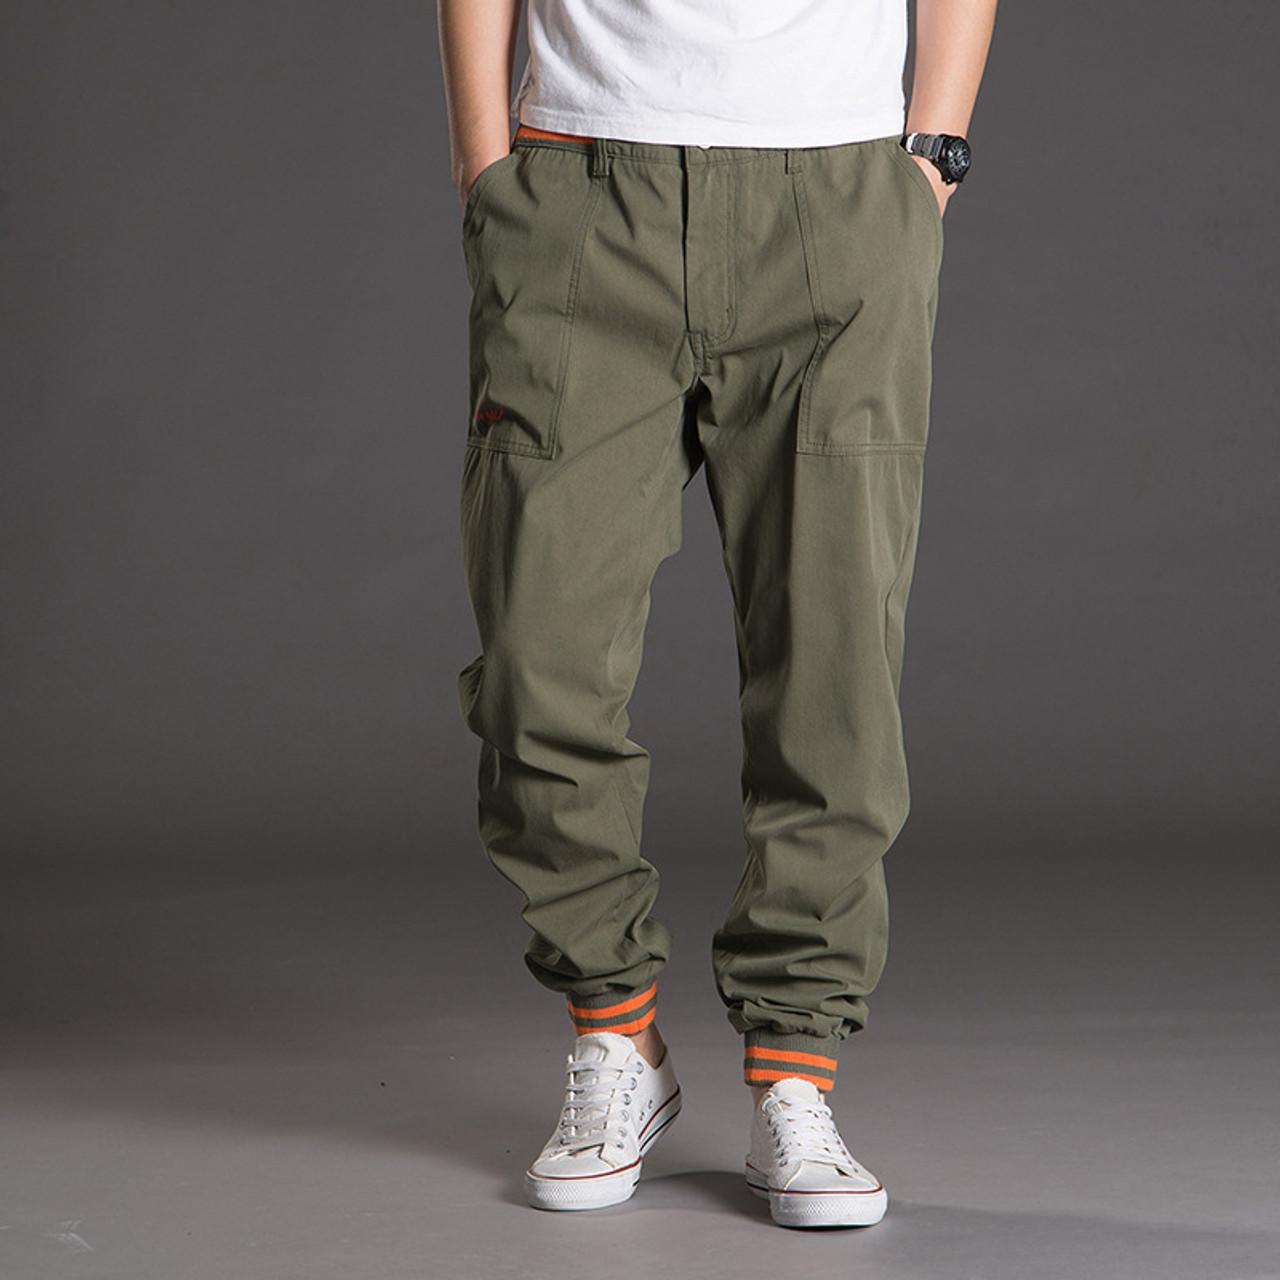 ff0ba3a9604b8 Men Tactical Pants Camo Jogger Casual Cotton Trousers Multi Pocket Military  Style Army Camouflage Men's Cargo Pants Plus Size - OnshopDeals.Com